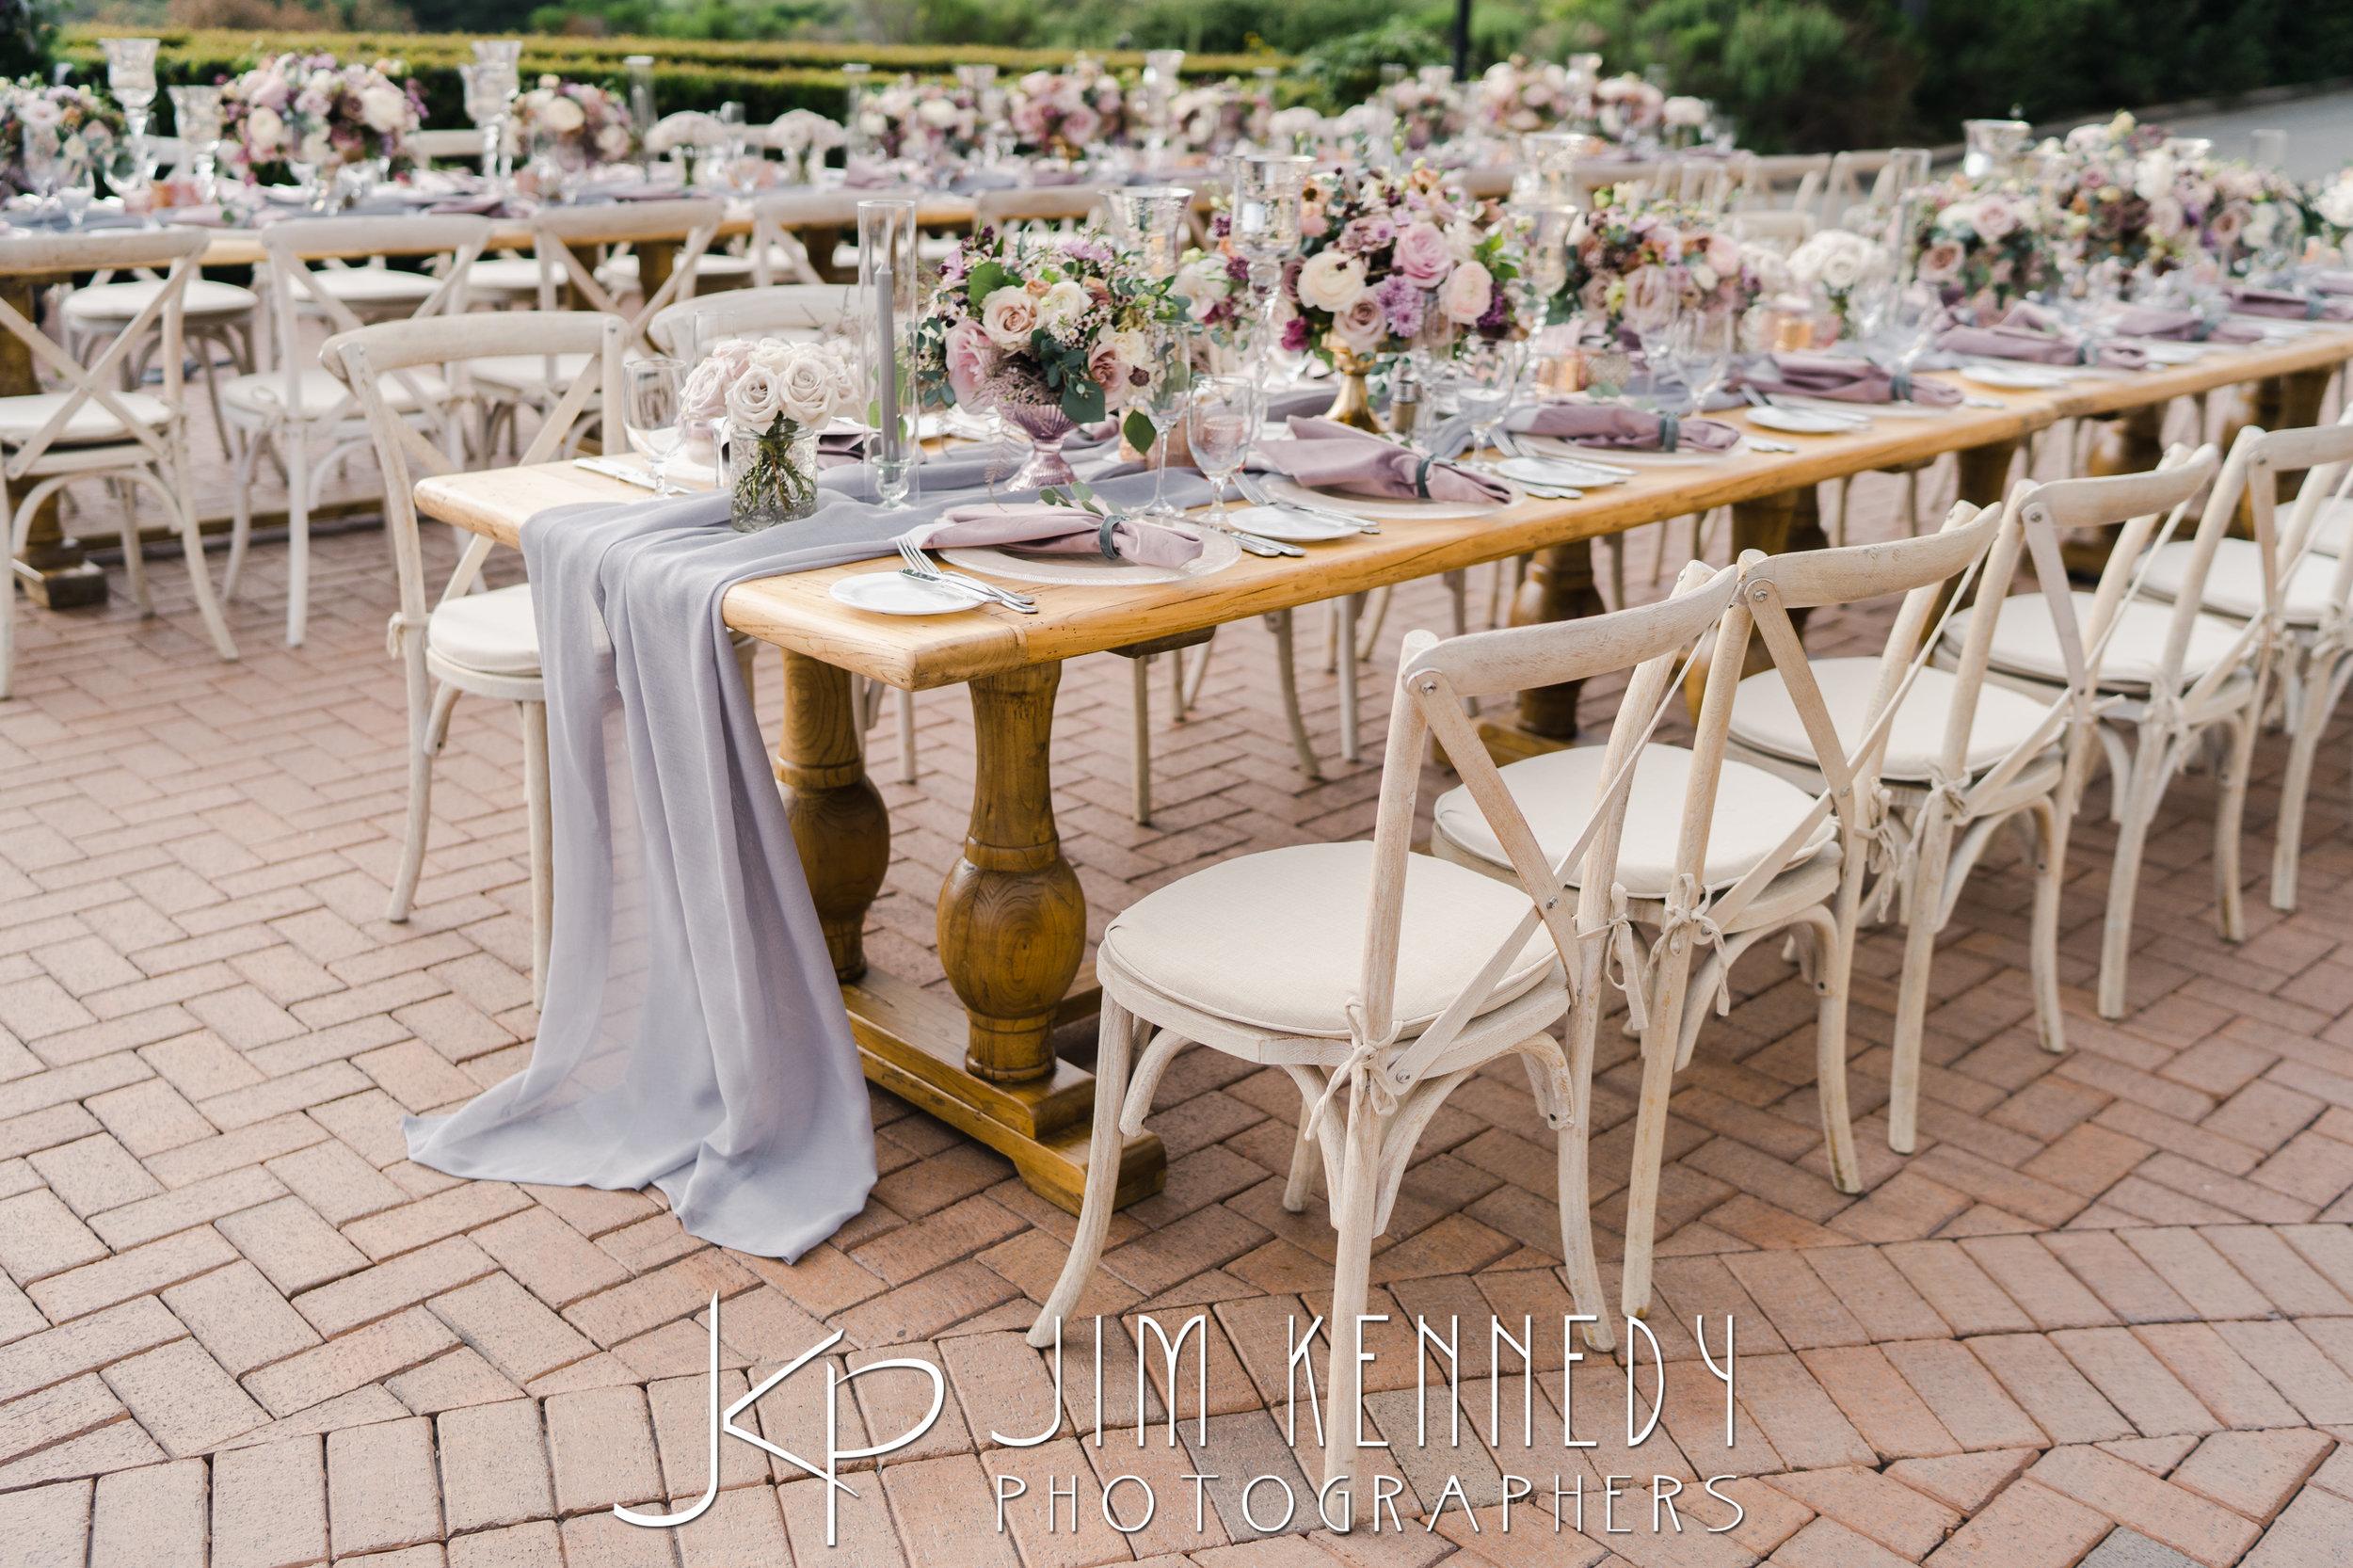 pelican-hill-wedding-jim-kenedy-photographers_0185.JPG